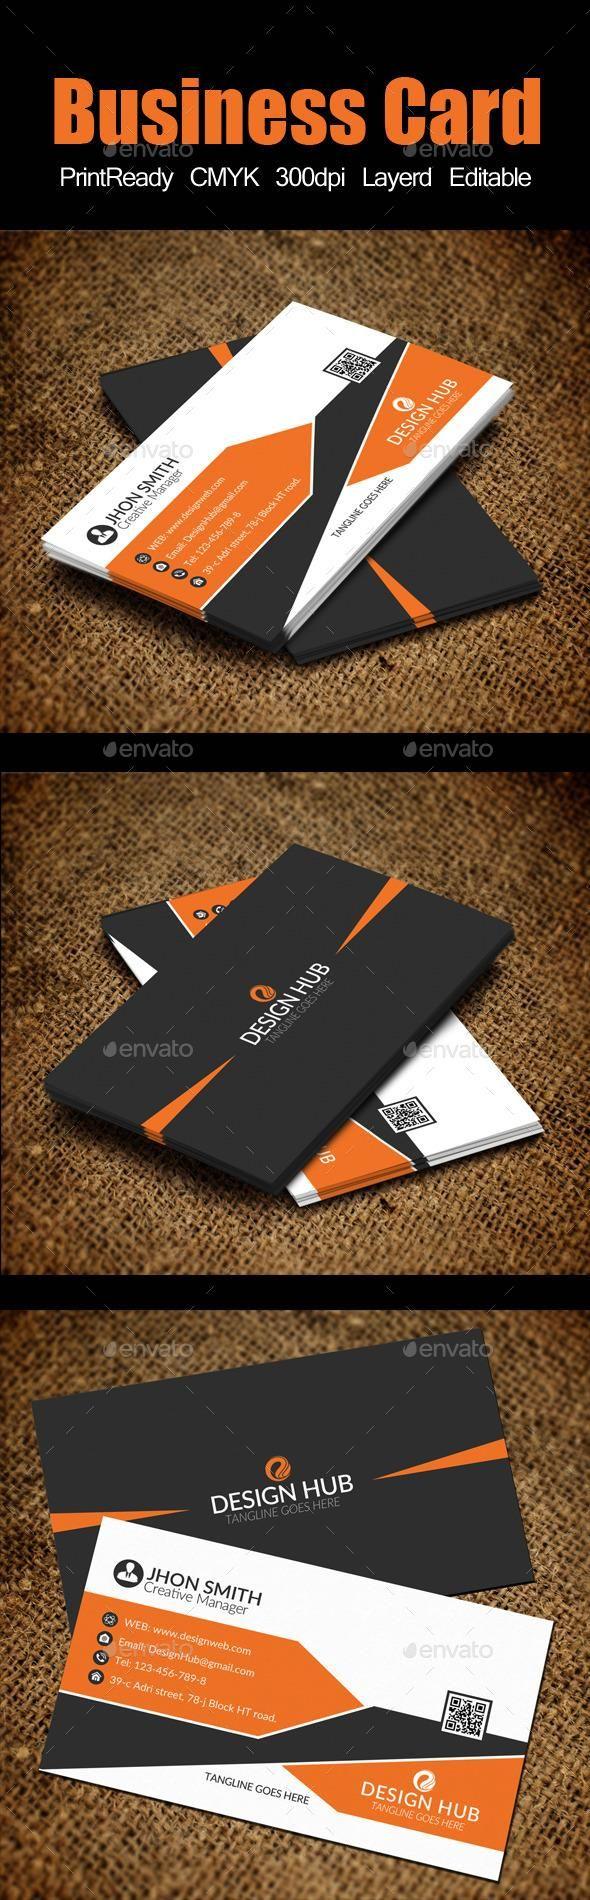 Business Card Business Card Design Minimal Free Business Cards Business Card Photoshop